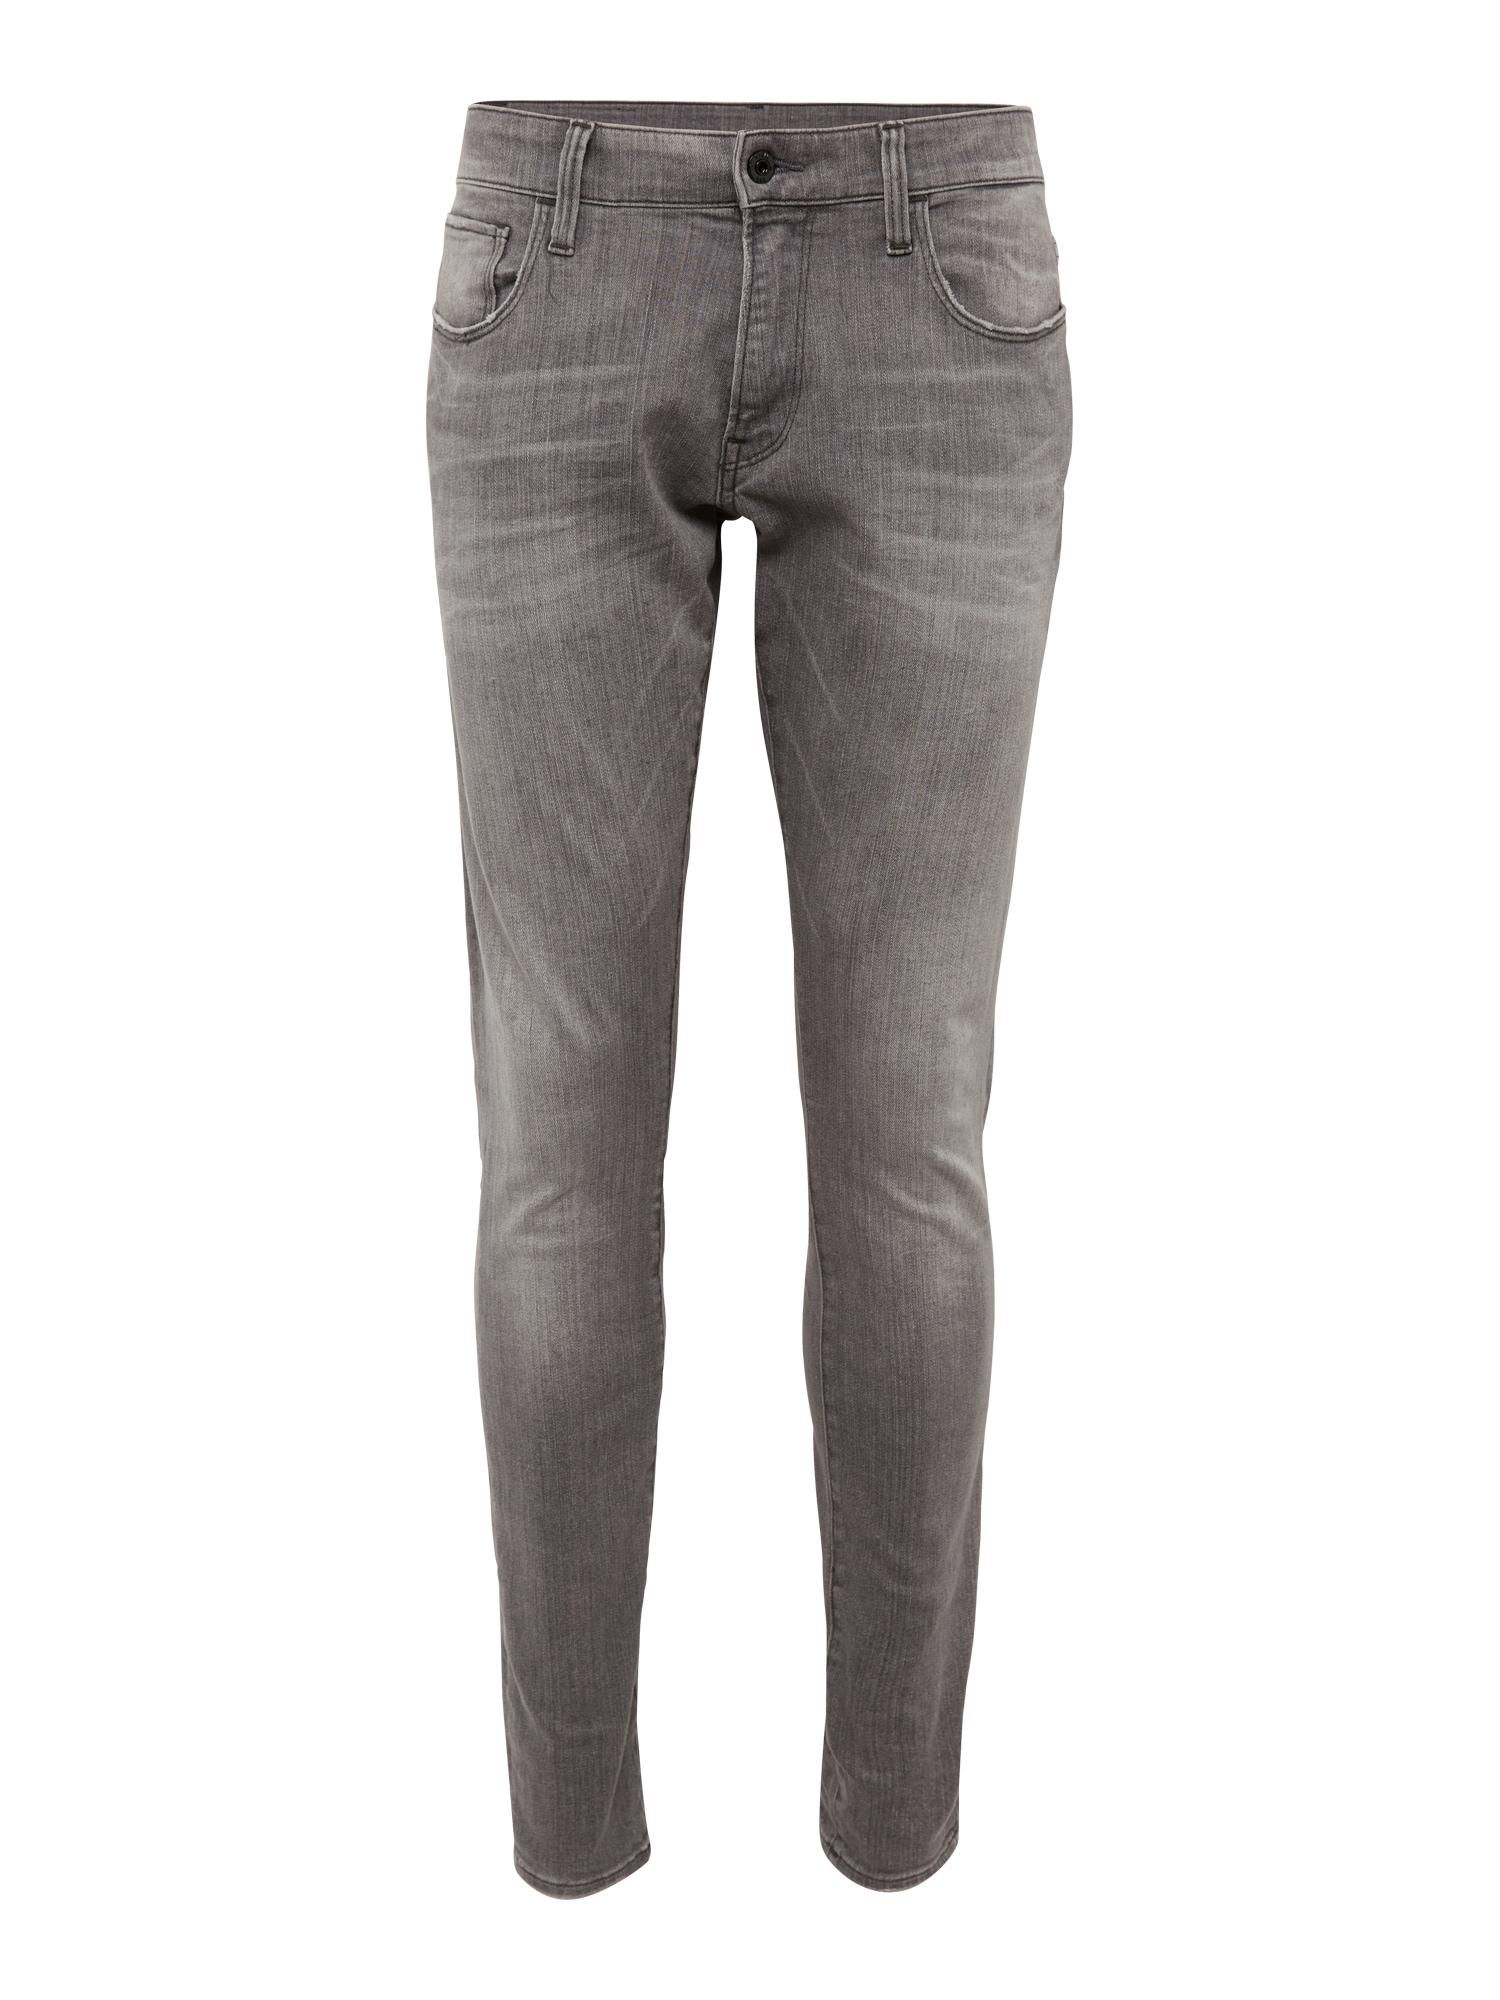 G-STAR RAW Heren Jeans 3301 Deconstructed Super Slim grey denim